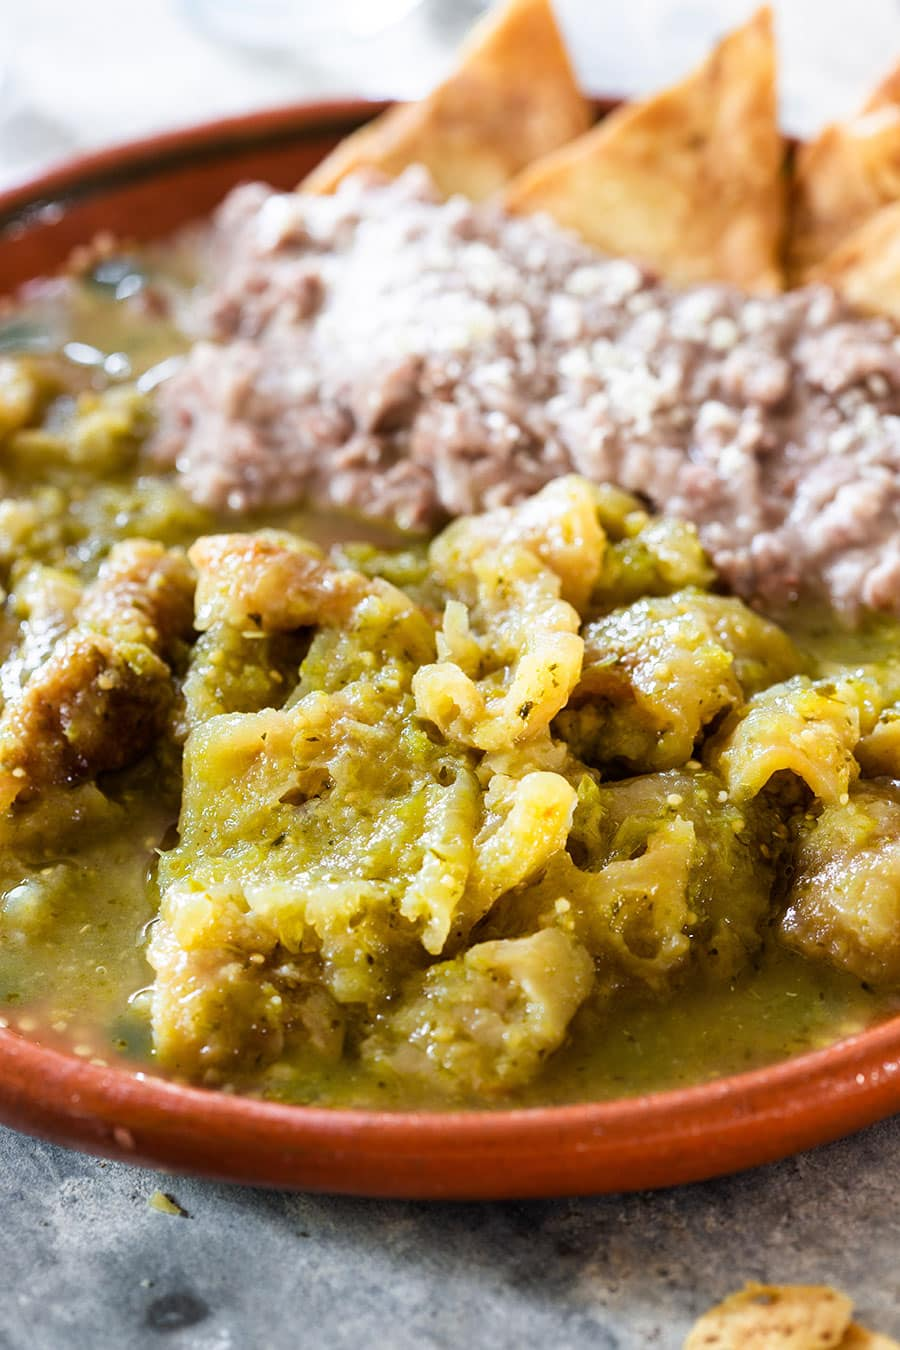 Close up for chicharron en salsa verde (pork cracklings with green sauce).